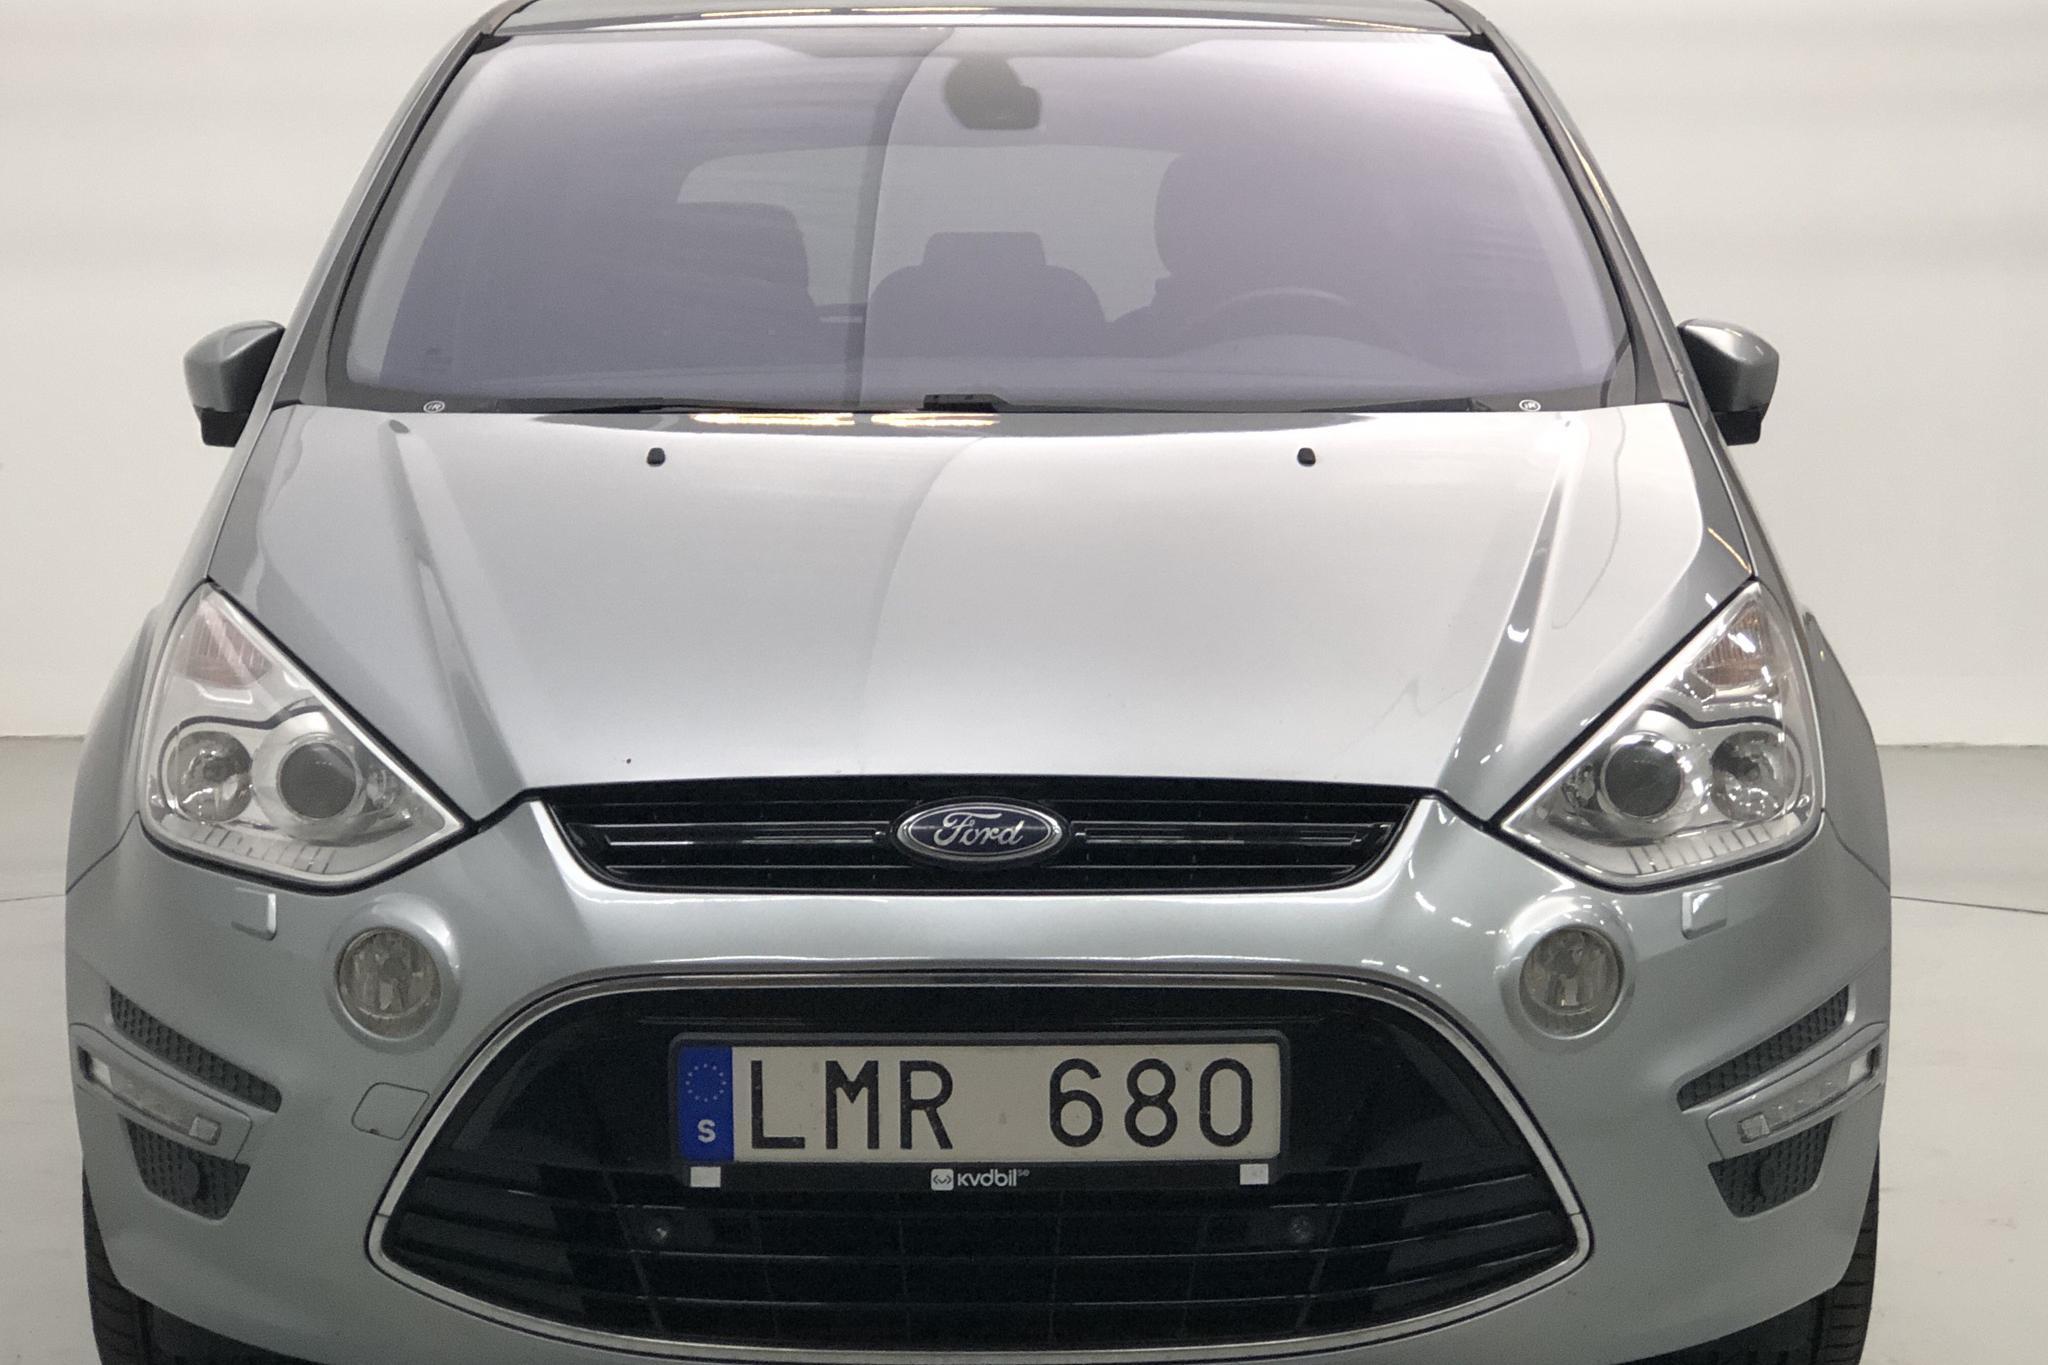 Ford S-MAX 2.2 Duratorq TDCi (200hk) - 225 820 km - Automatic - gray - 2011